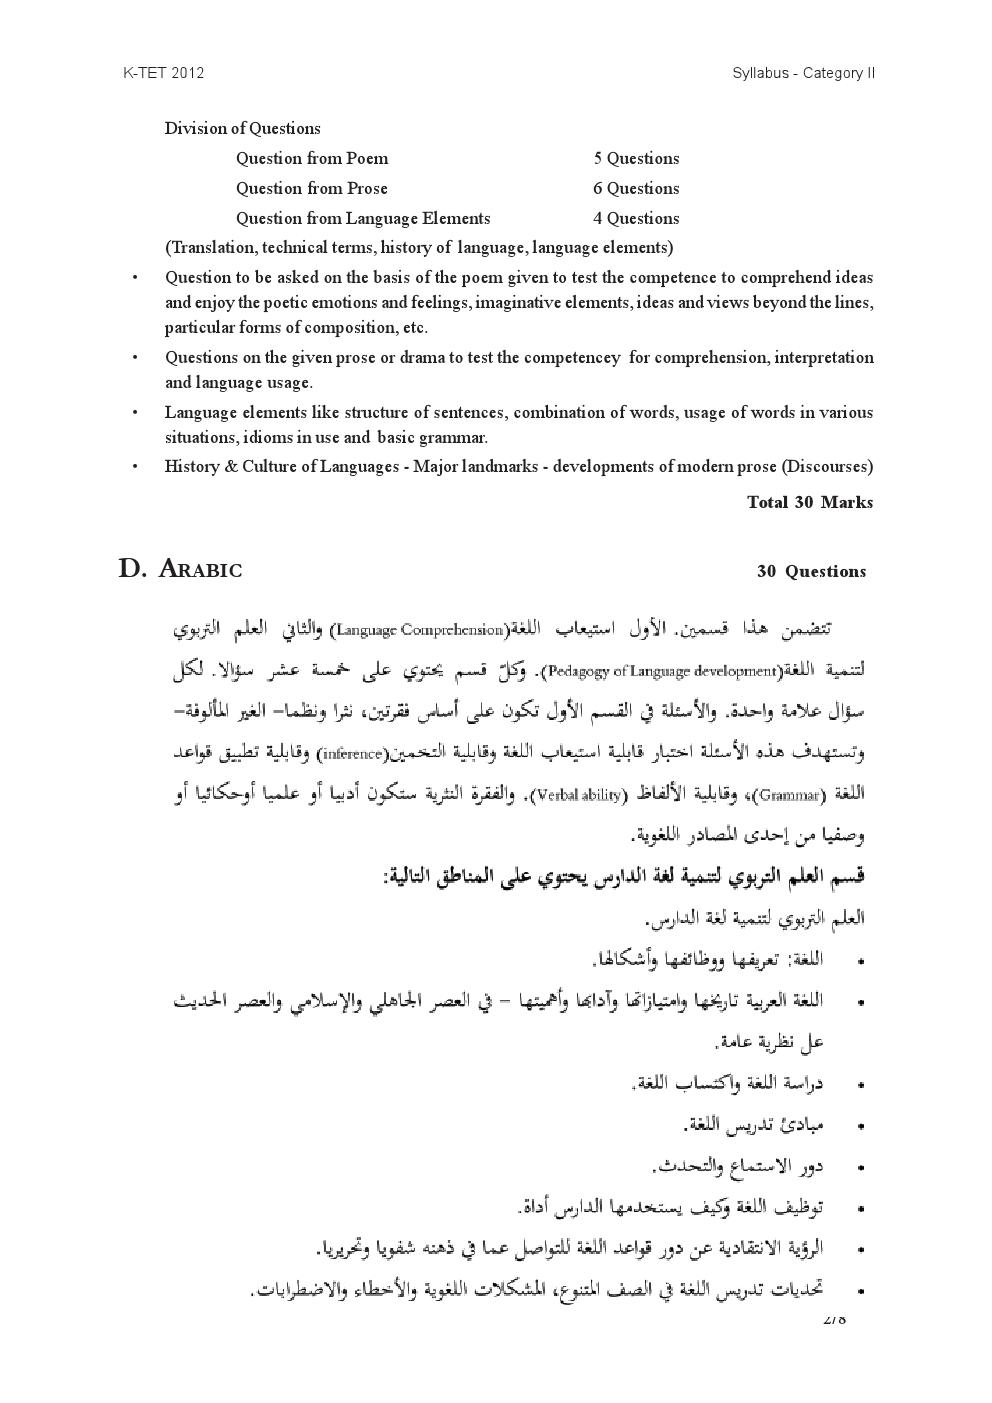 http://masterstudy.net/pdf/syllabus20008.jpg